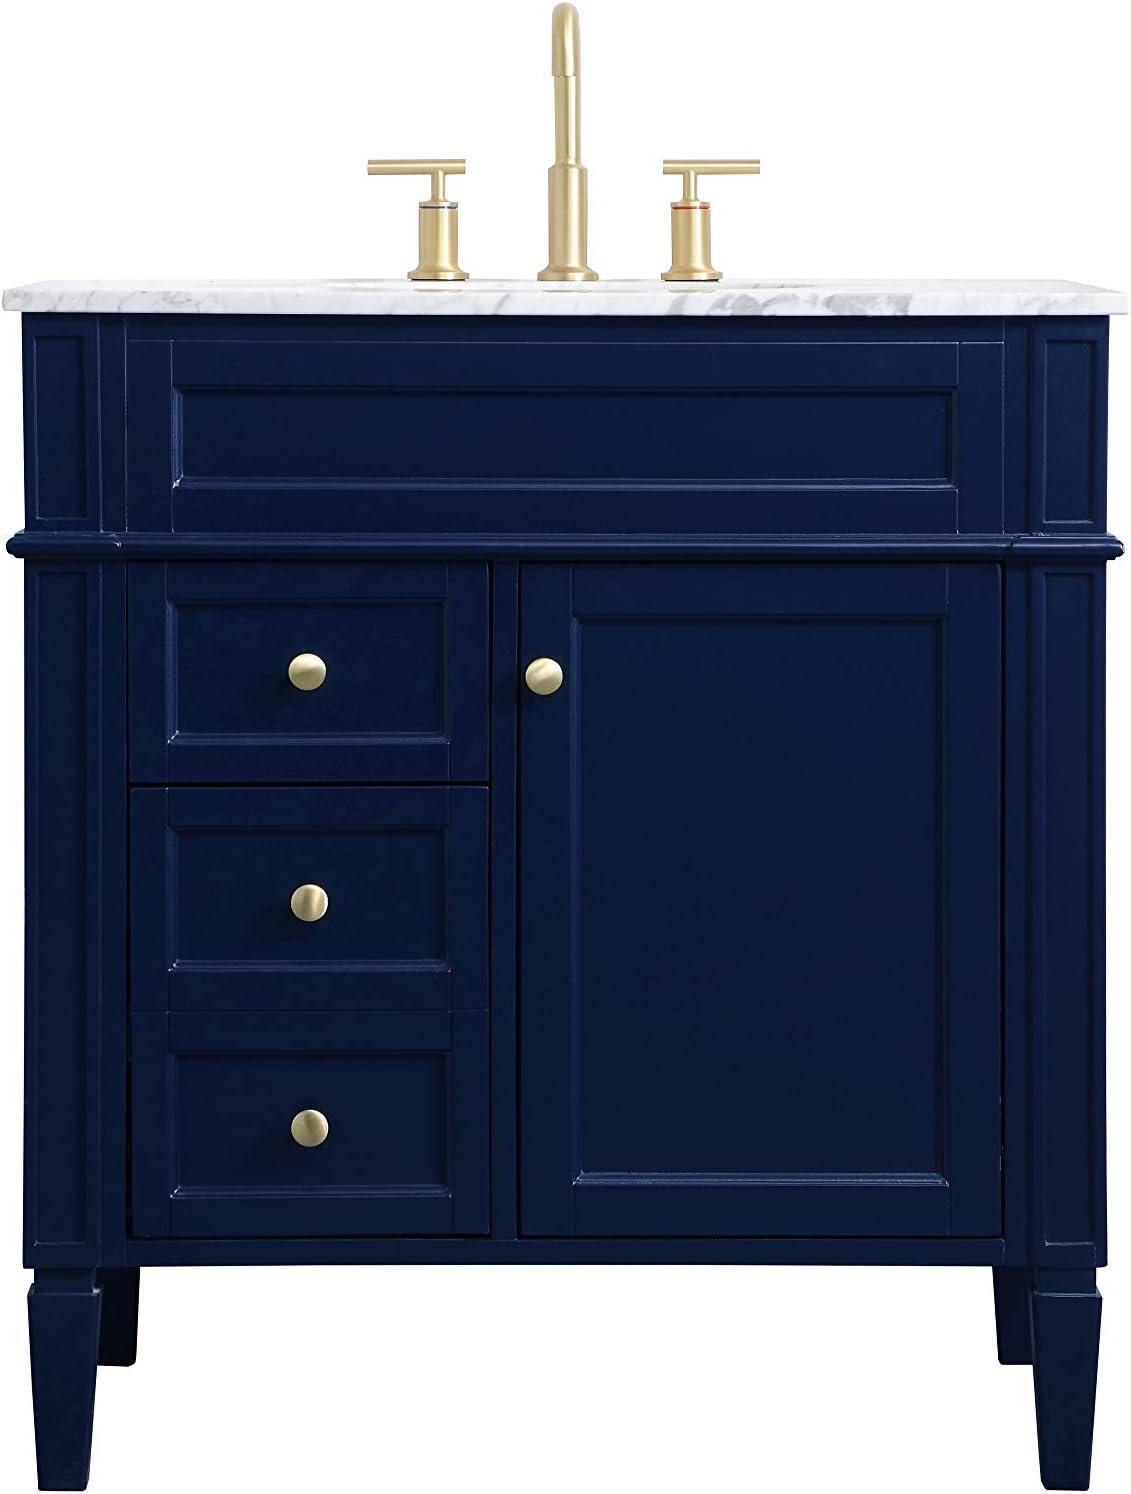 Amazon Com Elegant Decor 32 Inch Single Bathroom Vanity In Blue Furniture Decor